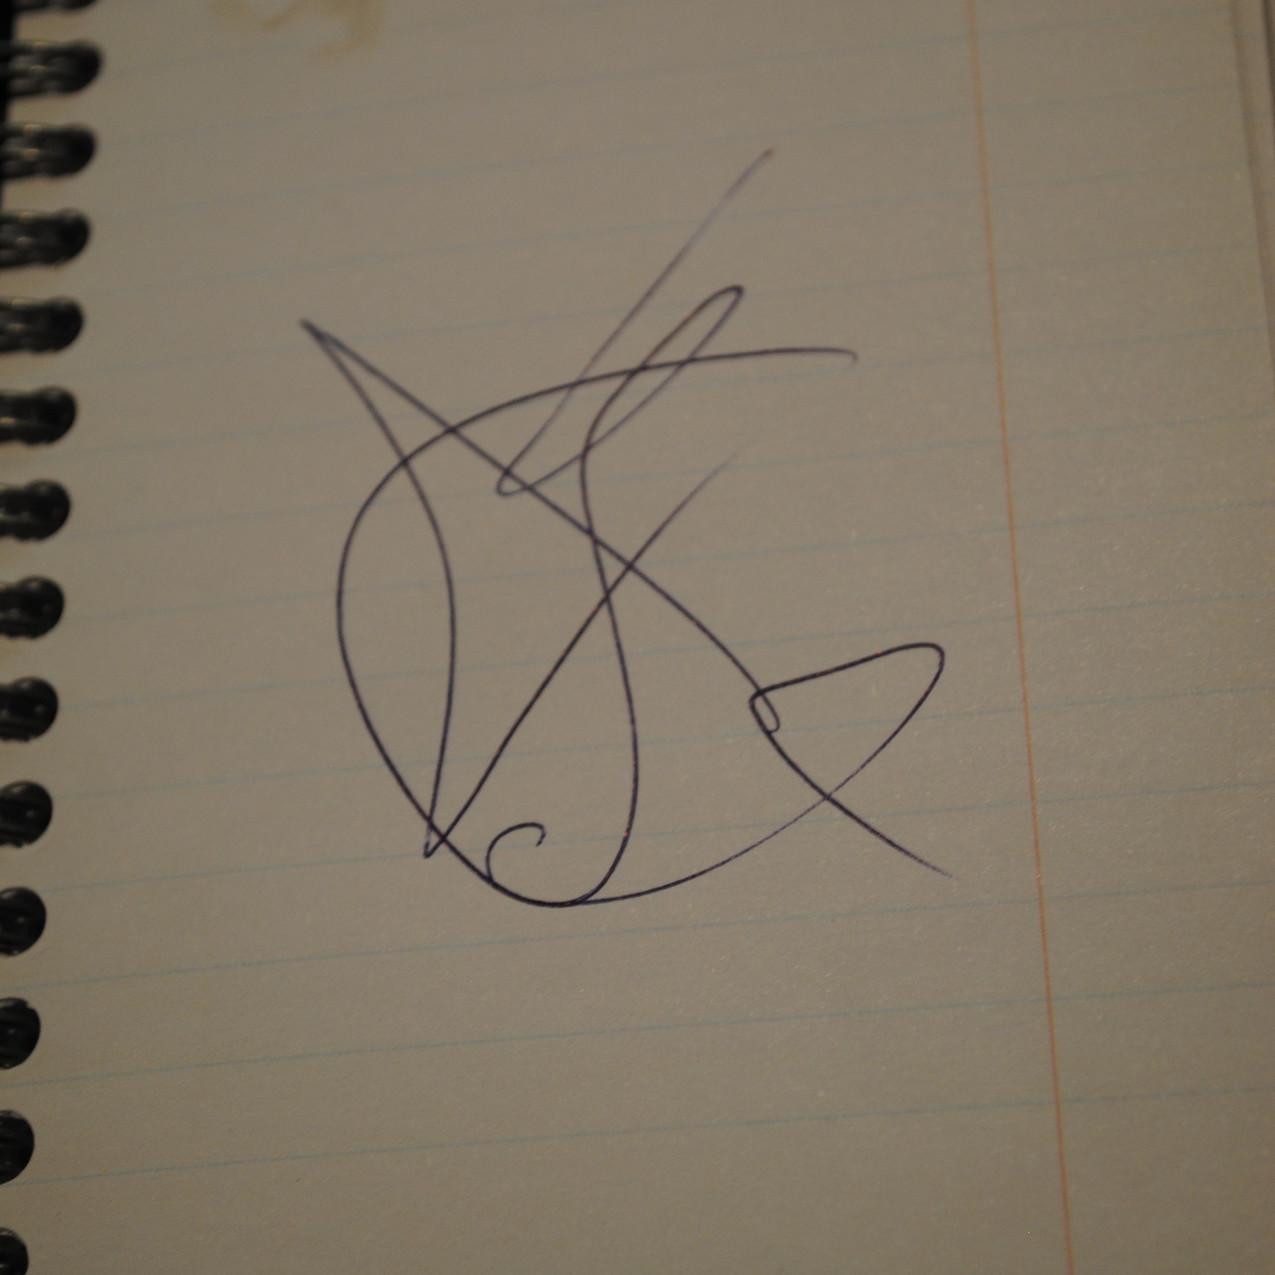 Hugh Jackman's autograph!!